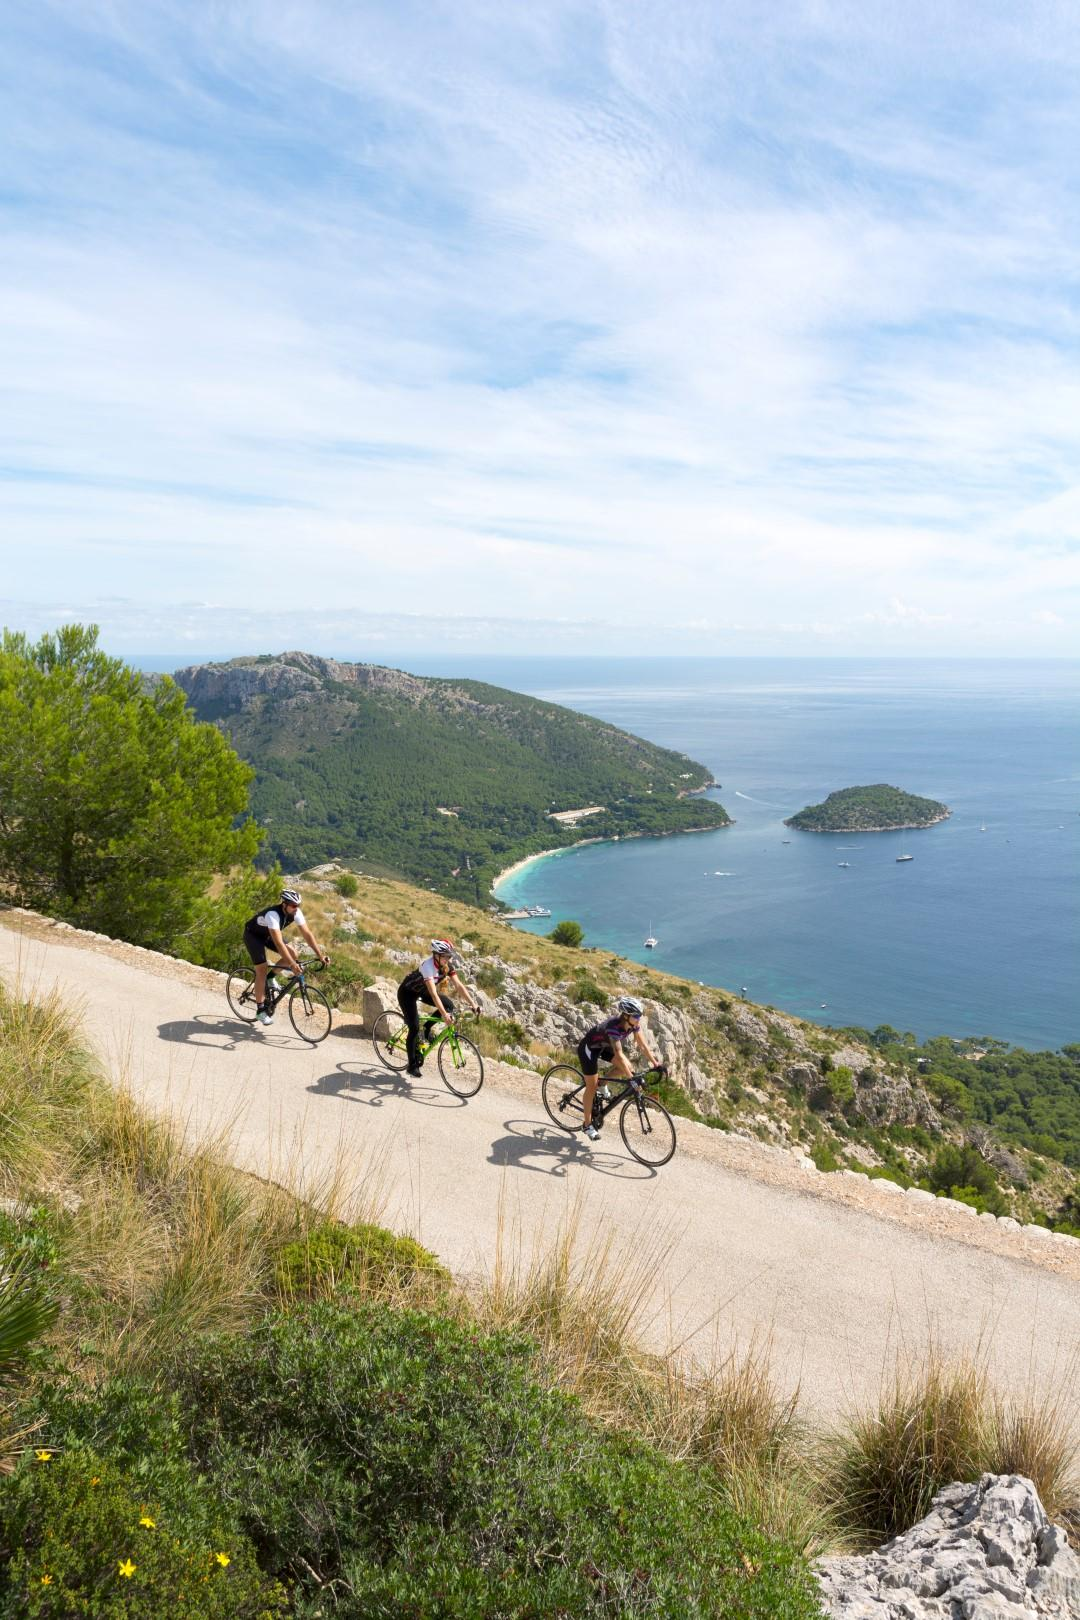 Baleari d inverno, ideali per il trekking e mountain bike